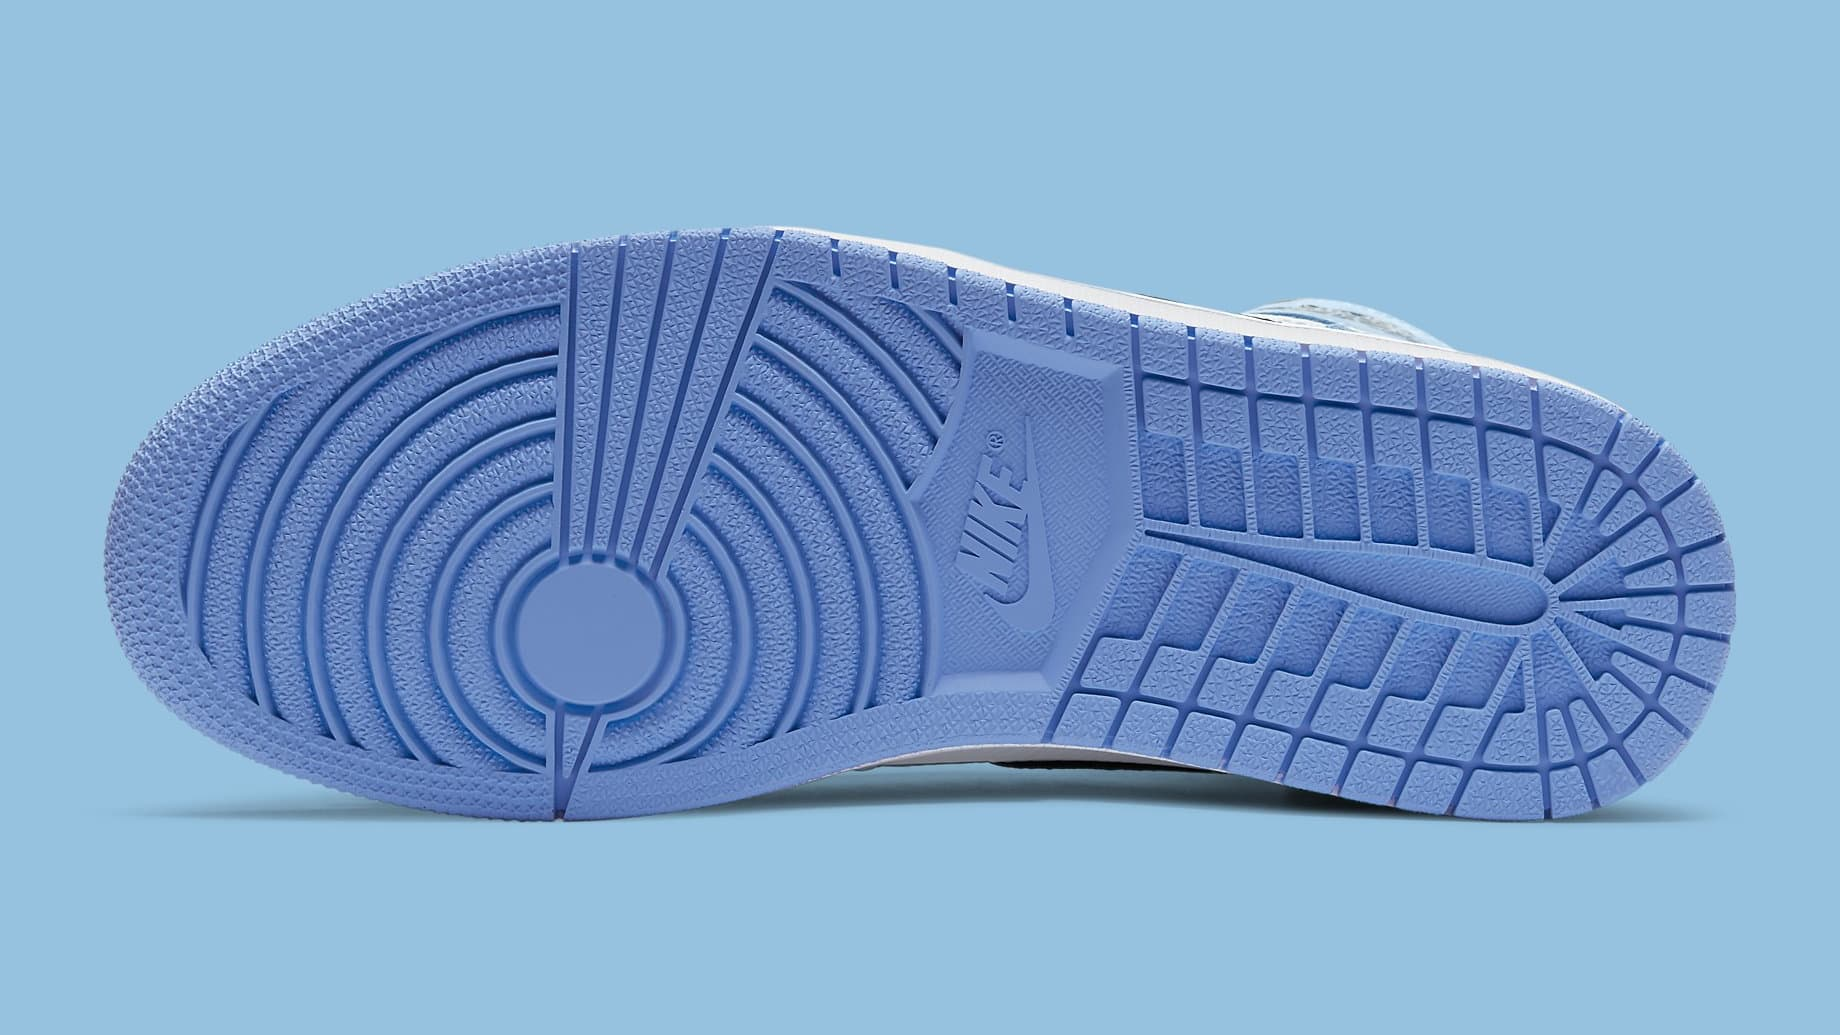 Air Jordan 1 University Blue Release Date 555088-134 Sole